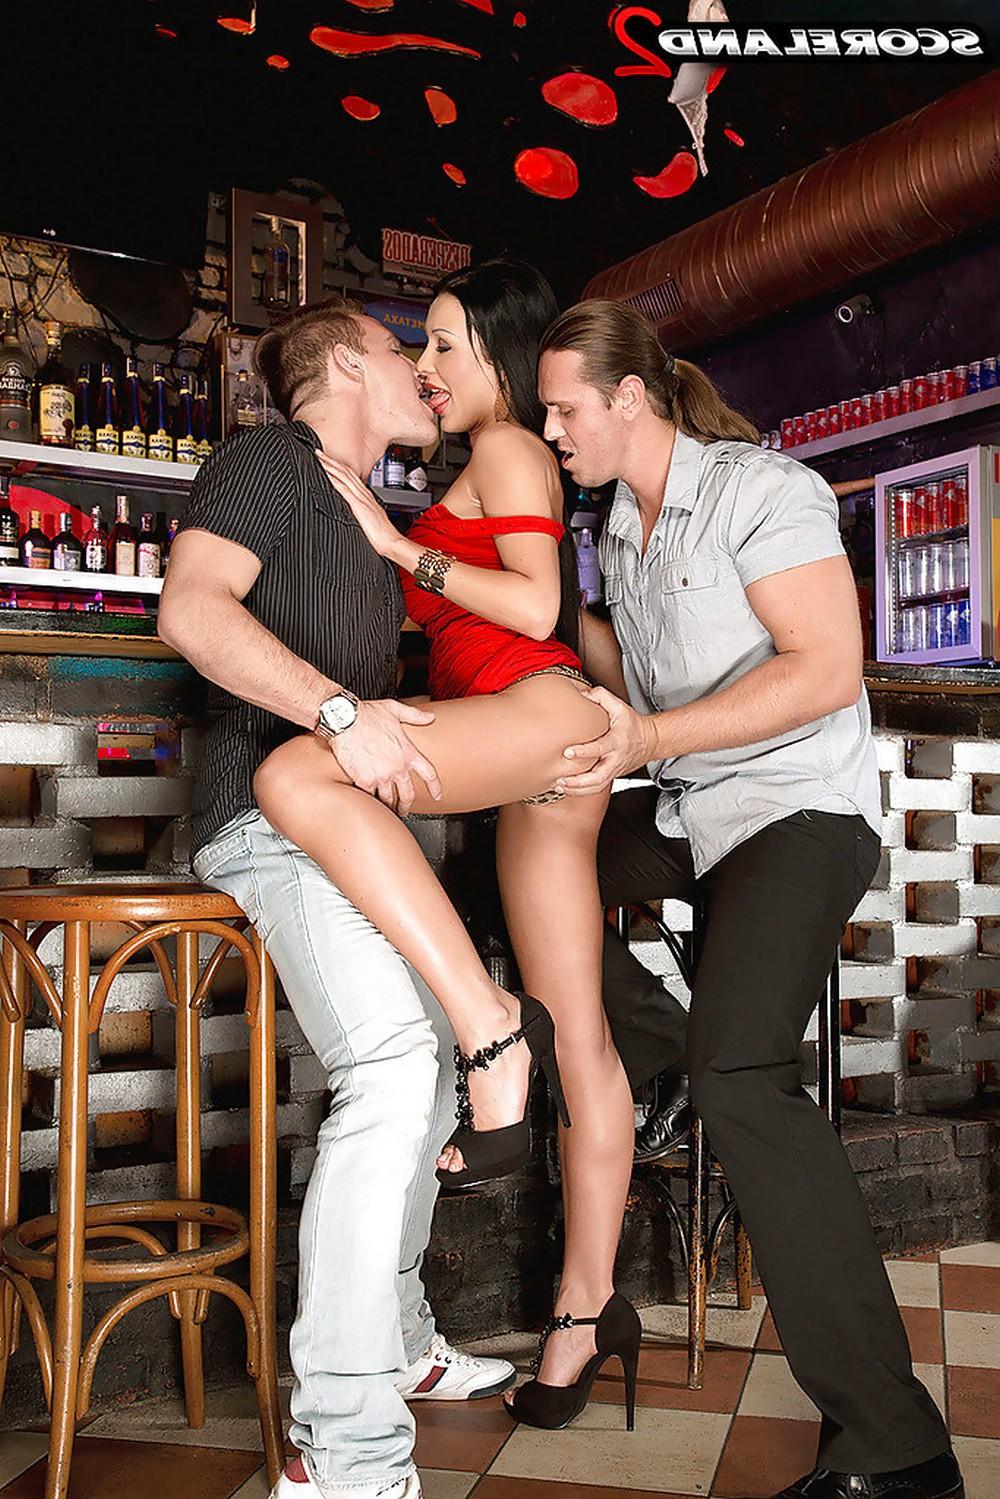 Patty Michova отдалась незнакомцам в баре